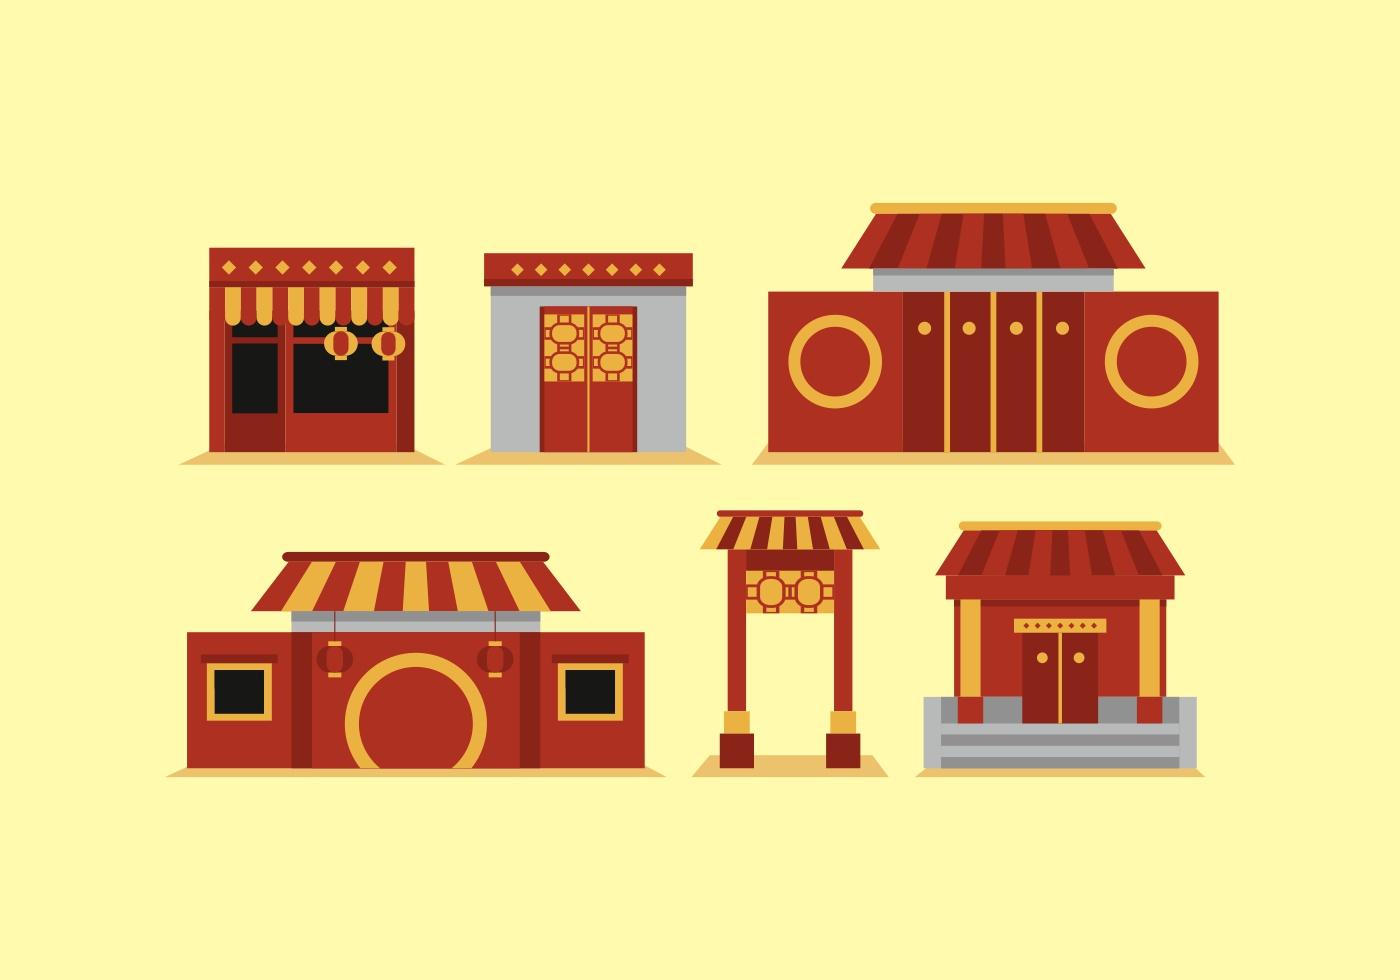 China Wall Free Vector Art - (2682 Free Downloads)